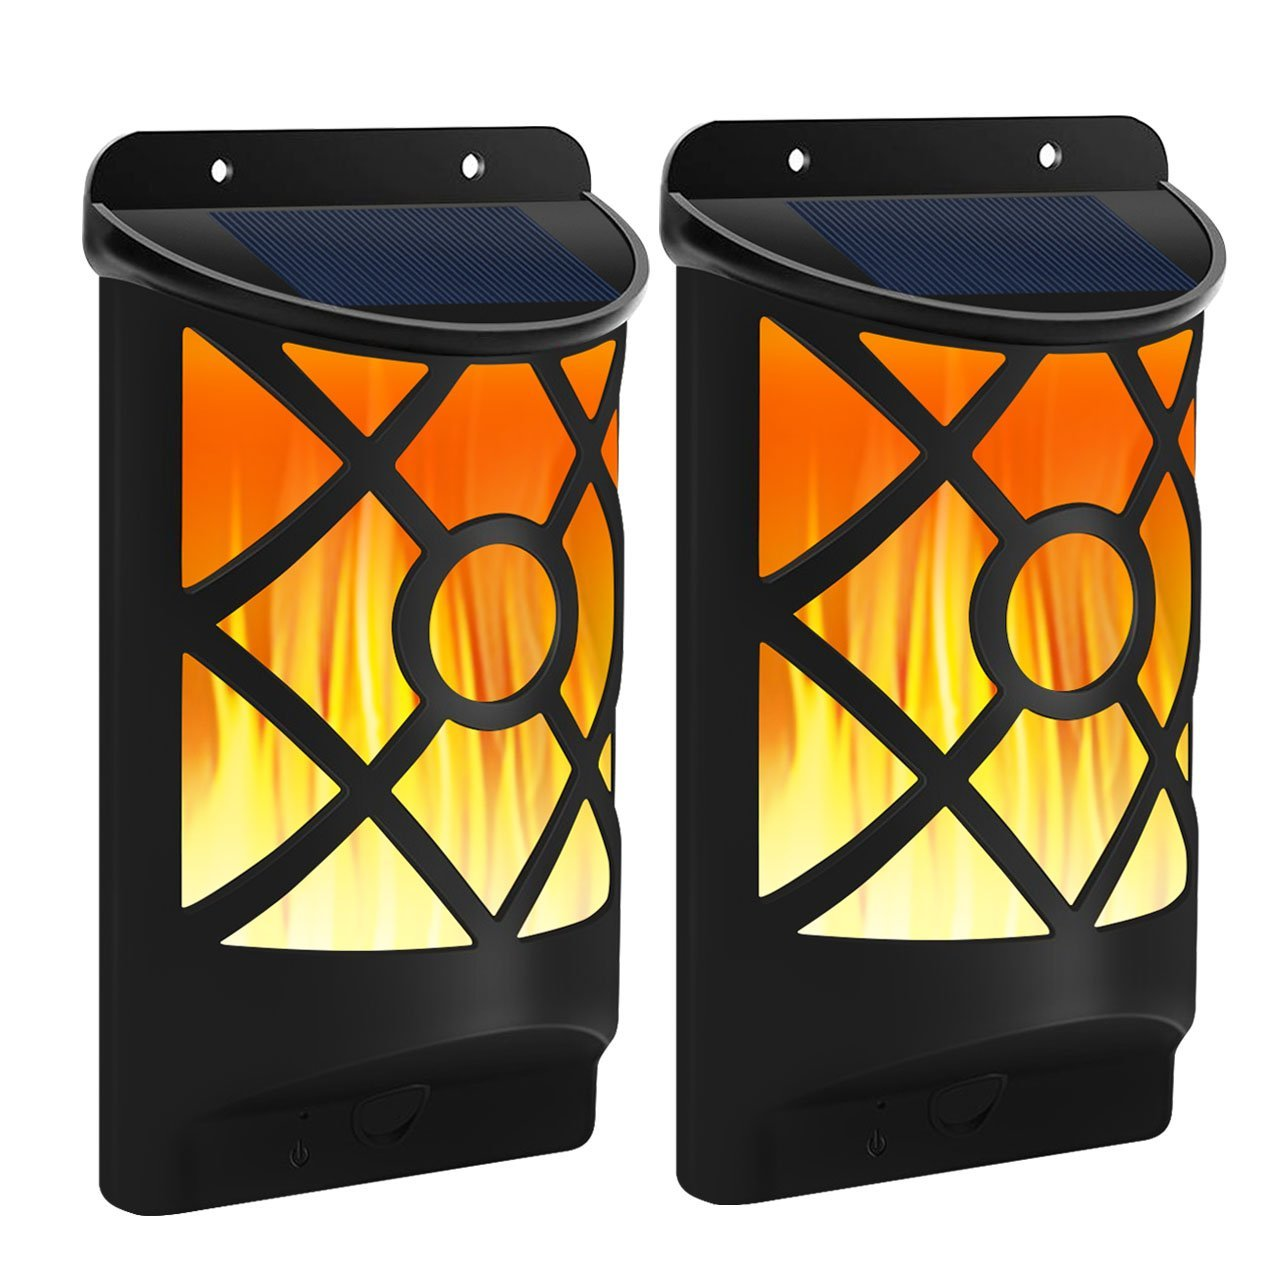 Luz solar led para exteriores, lámpara con sensor de movimiento, para acampar